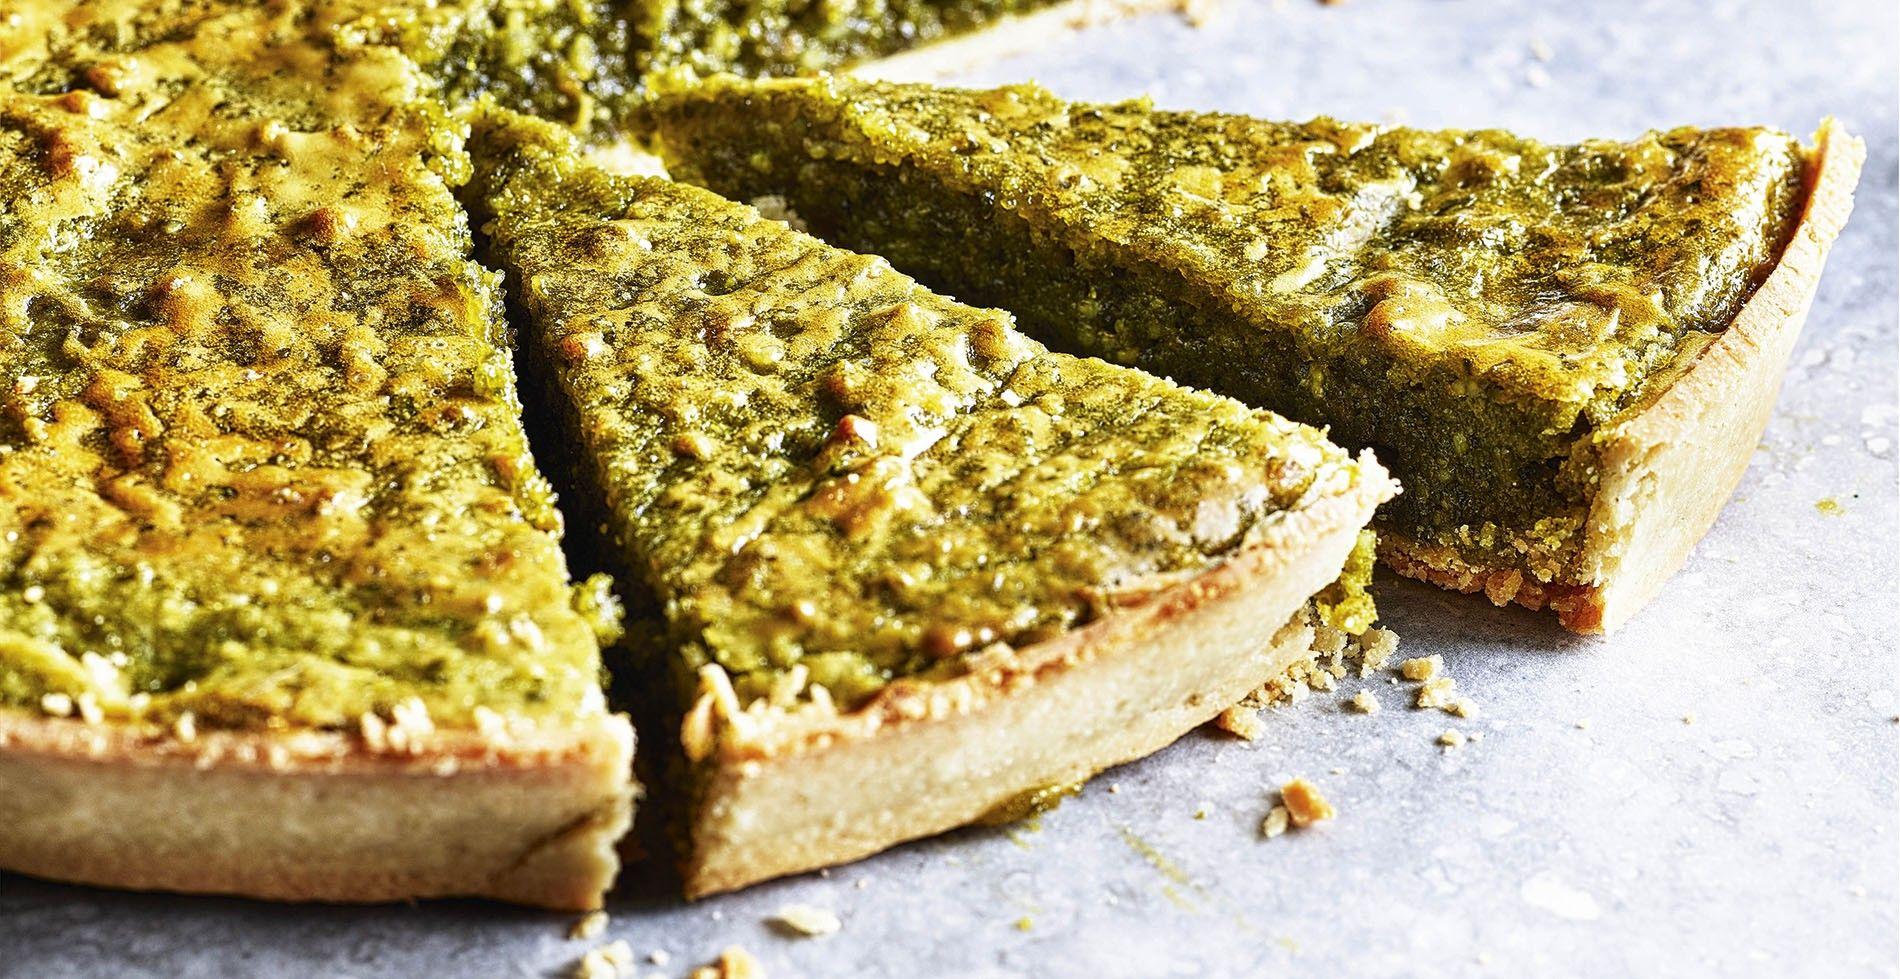 Pistachio orange tart, a recipe from Moorish